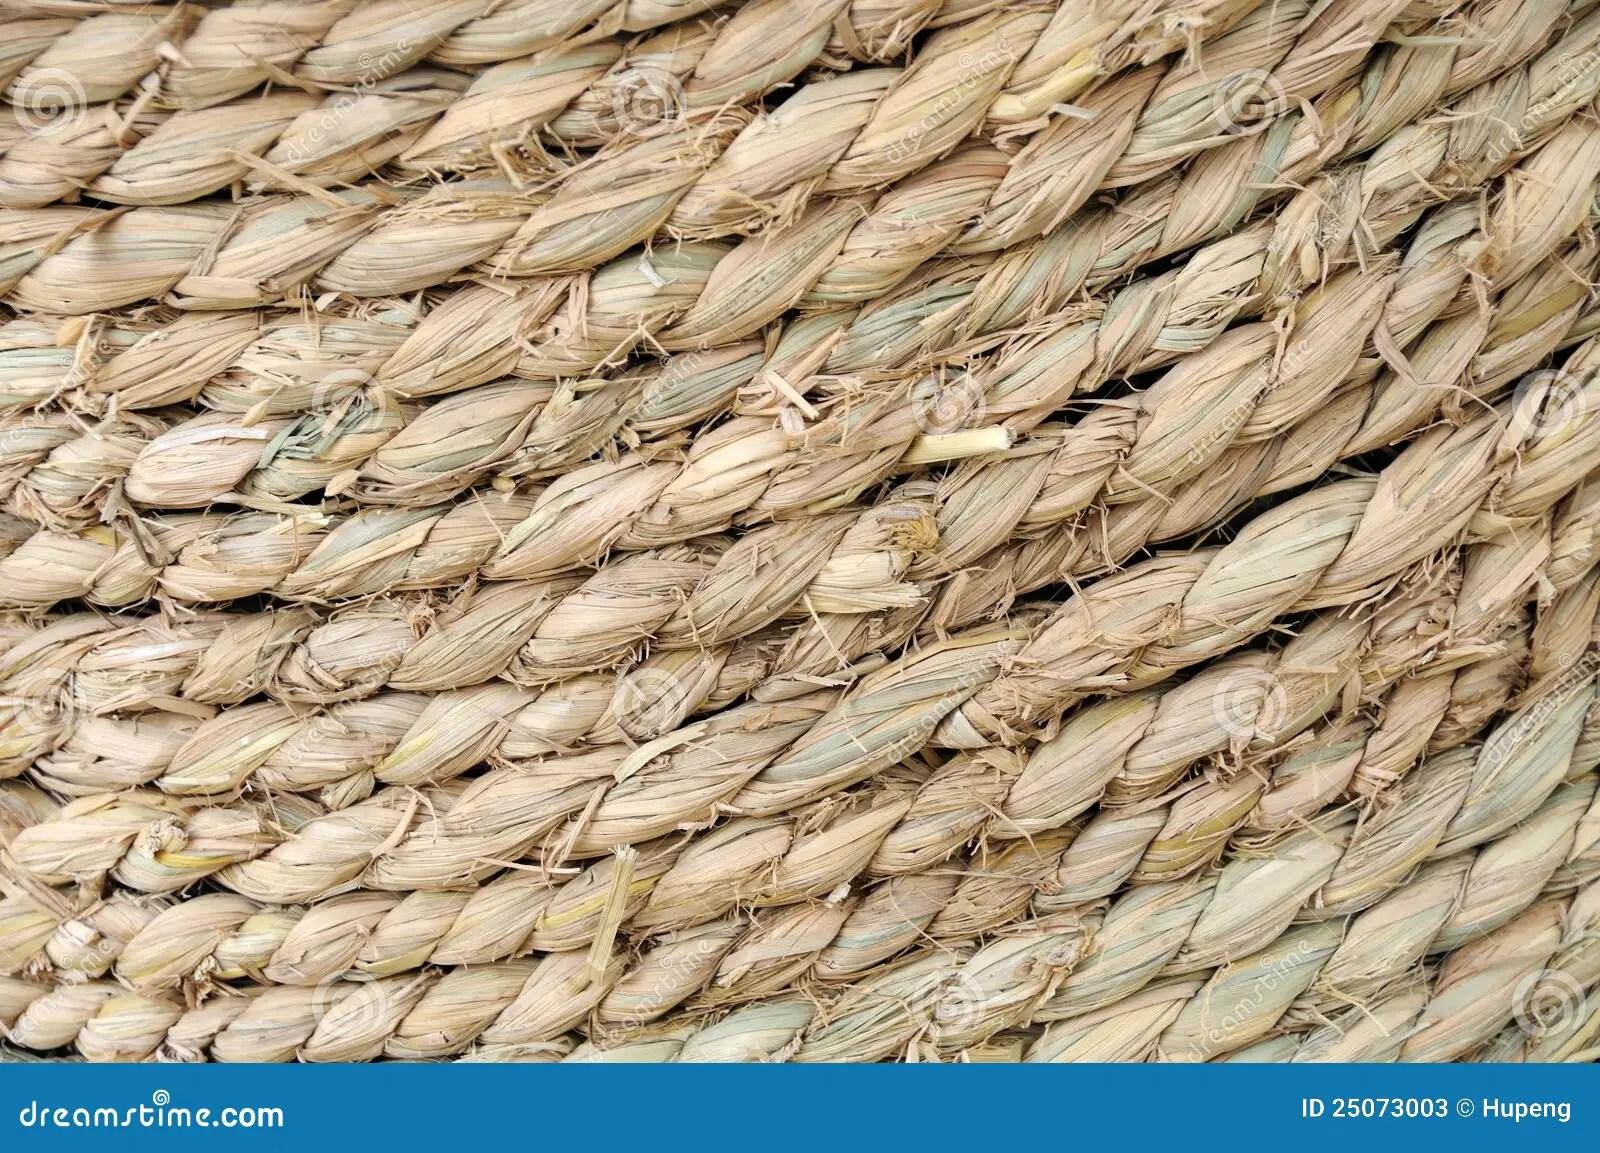 Straw rope texture stock image Image of fiber hemp